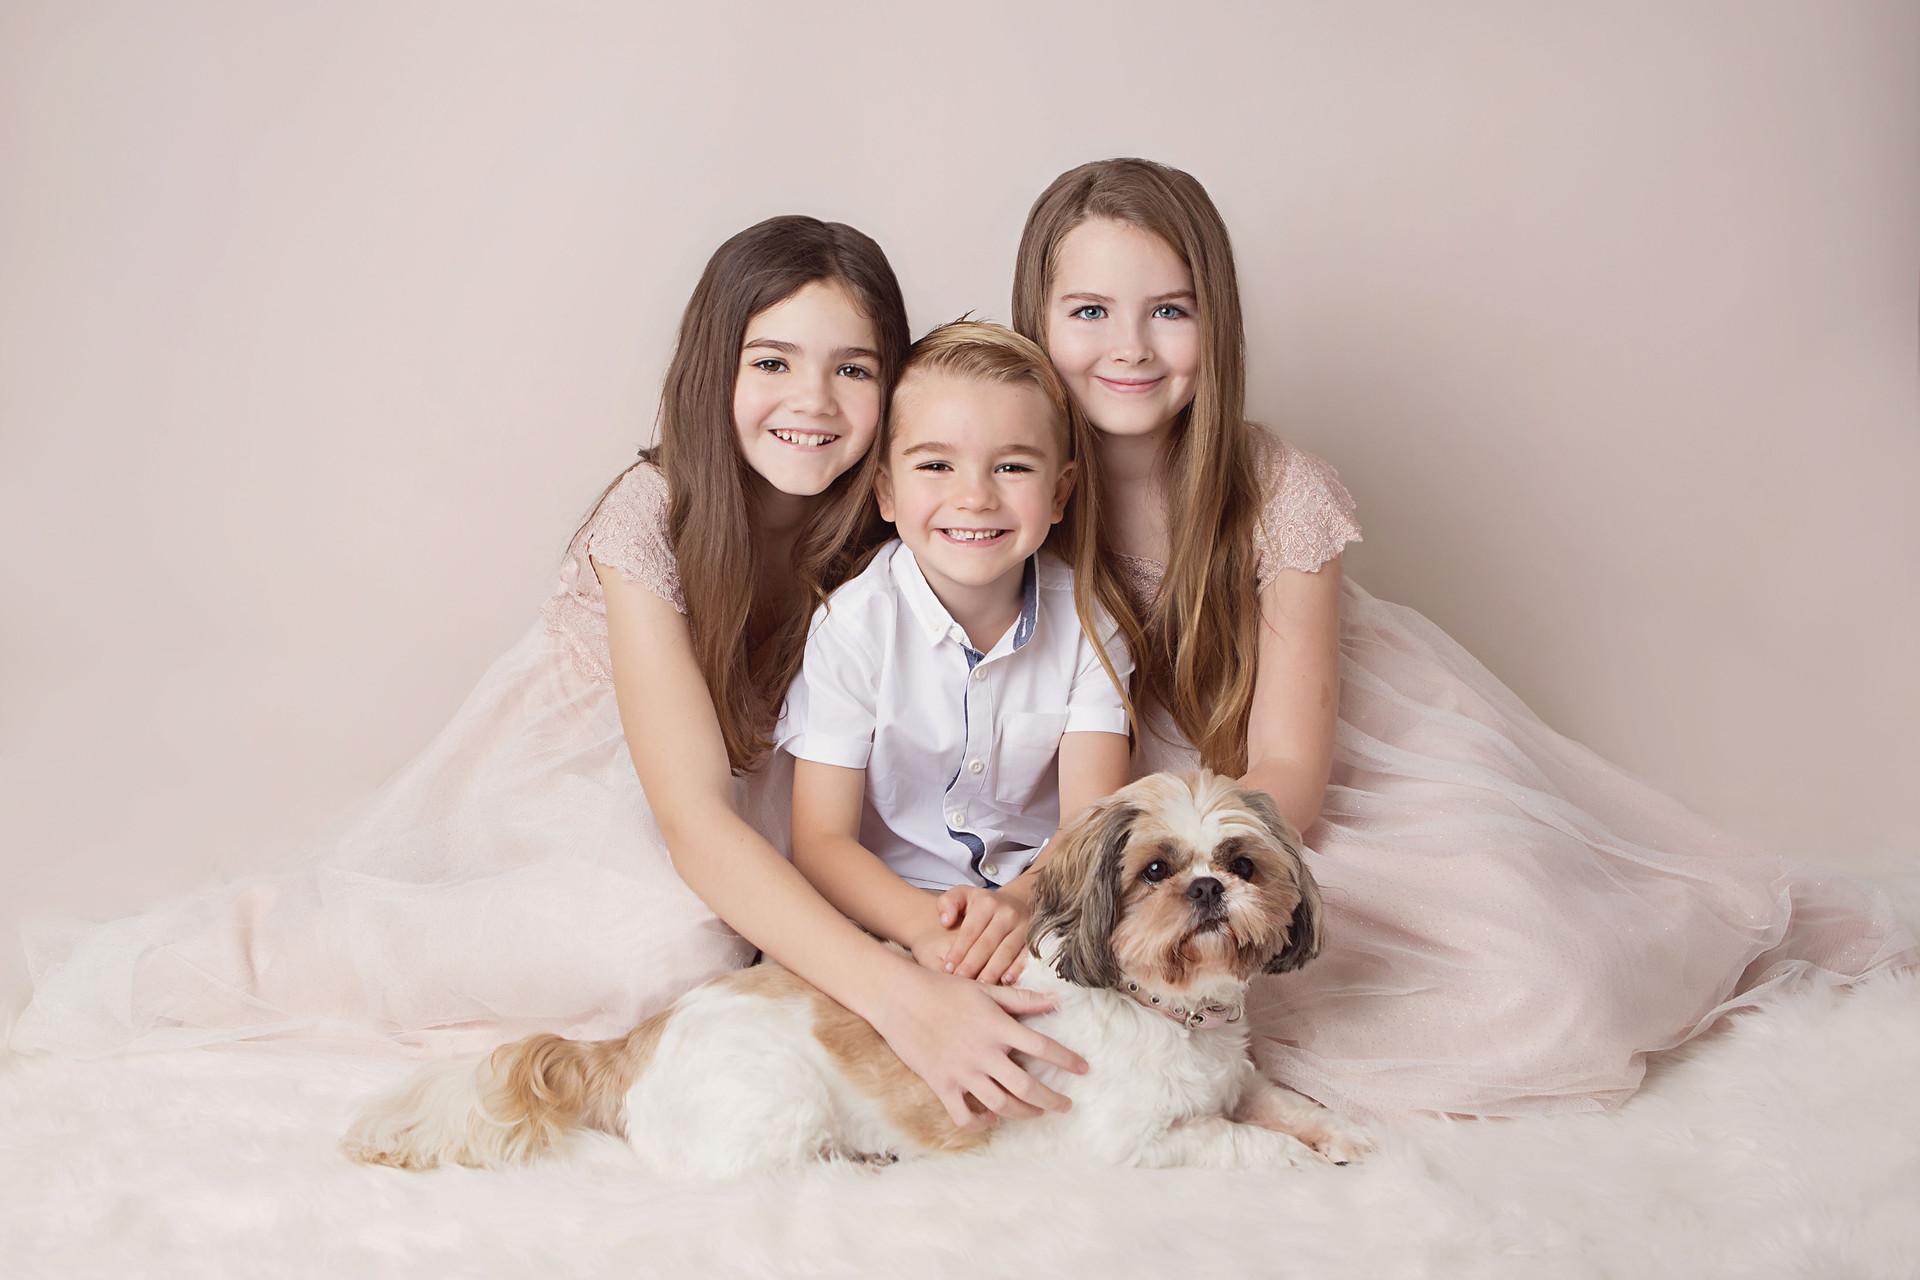 Family Pet Photograph Yanchep Perth